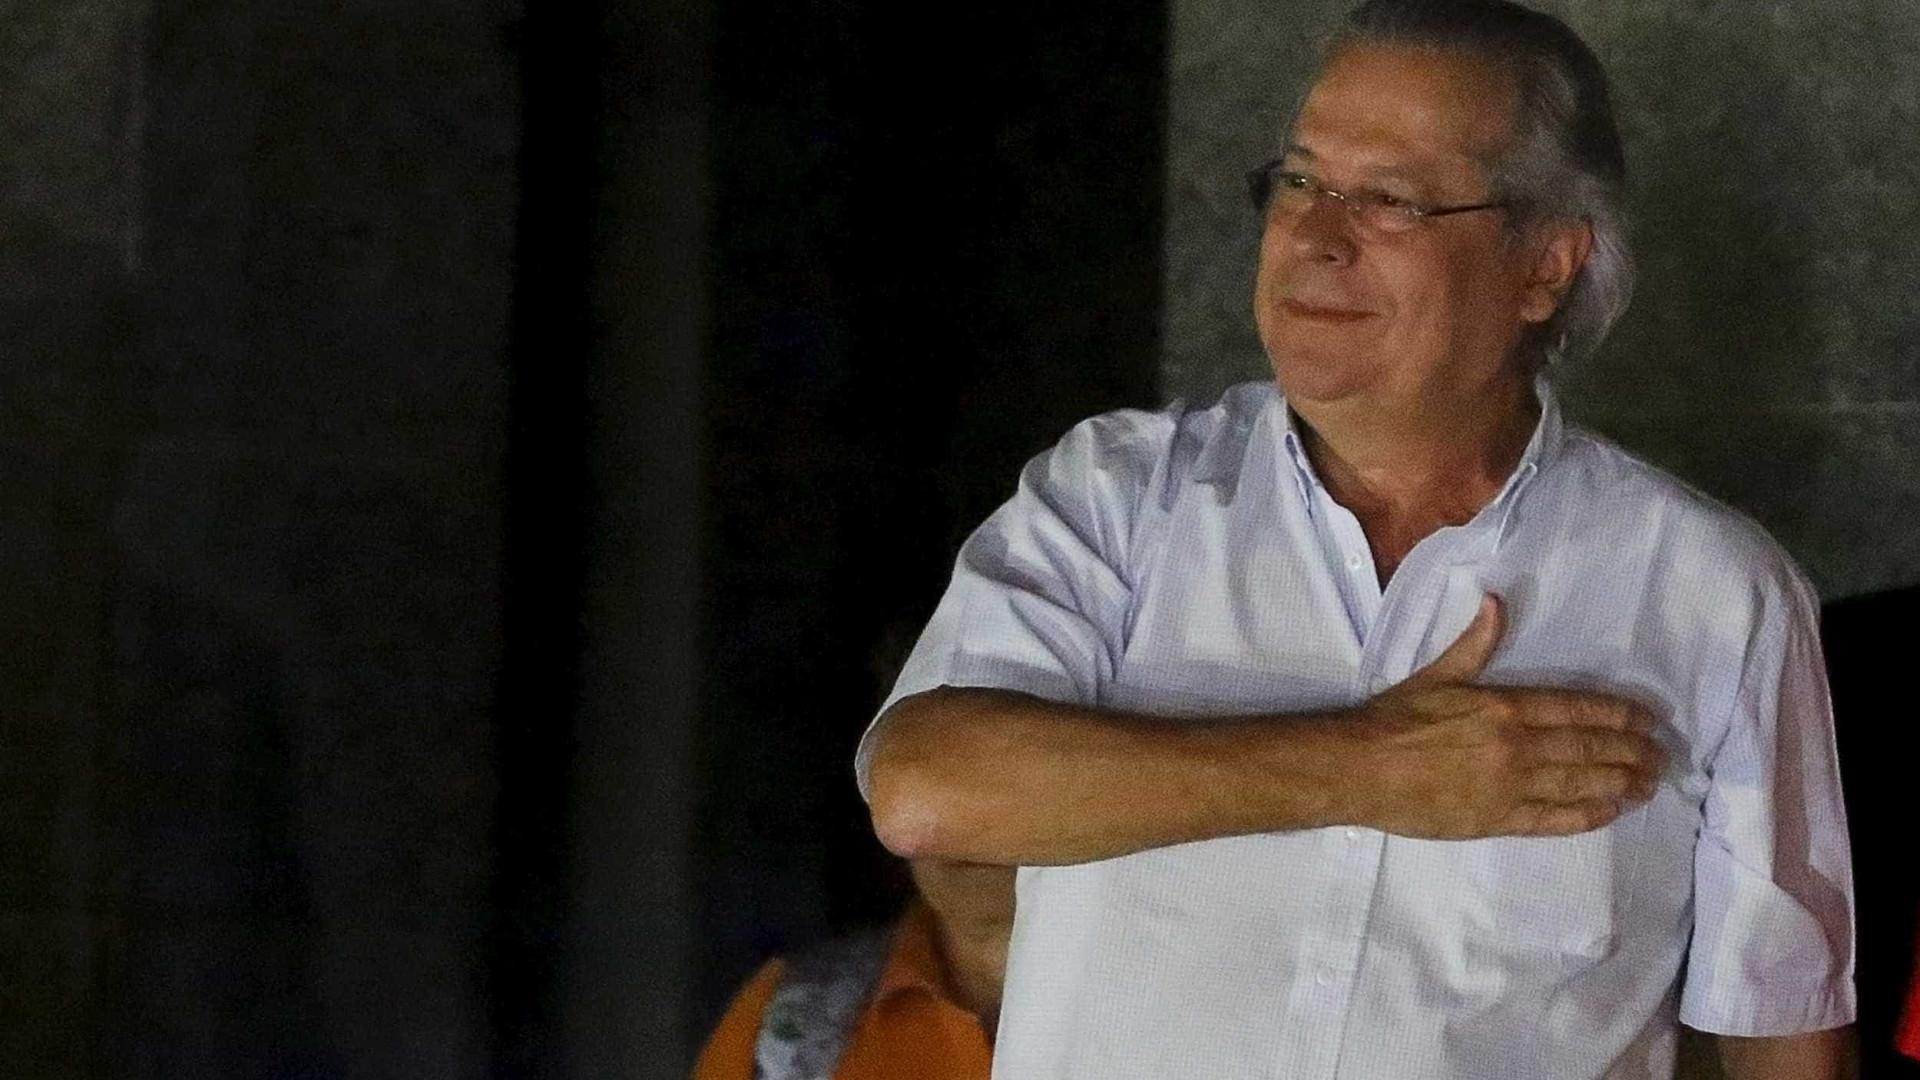 STF liberta ex-ministro José Dirceu,  preso há 2 anos pela Lava Jato